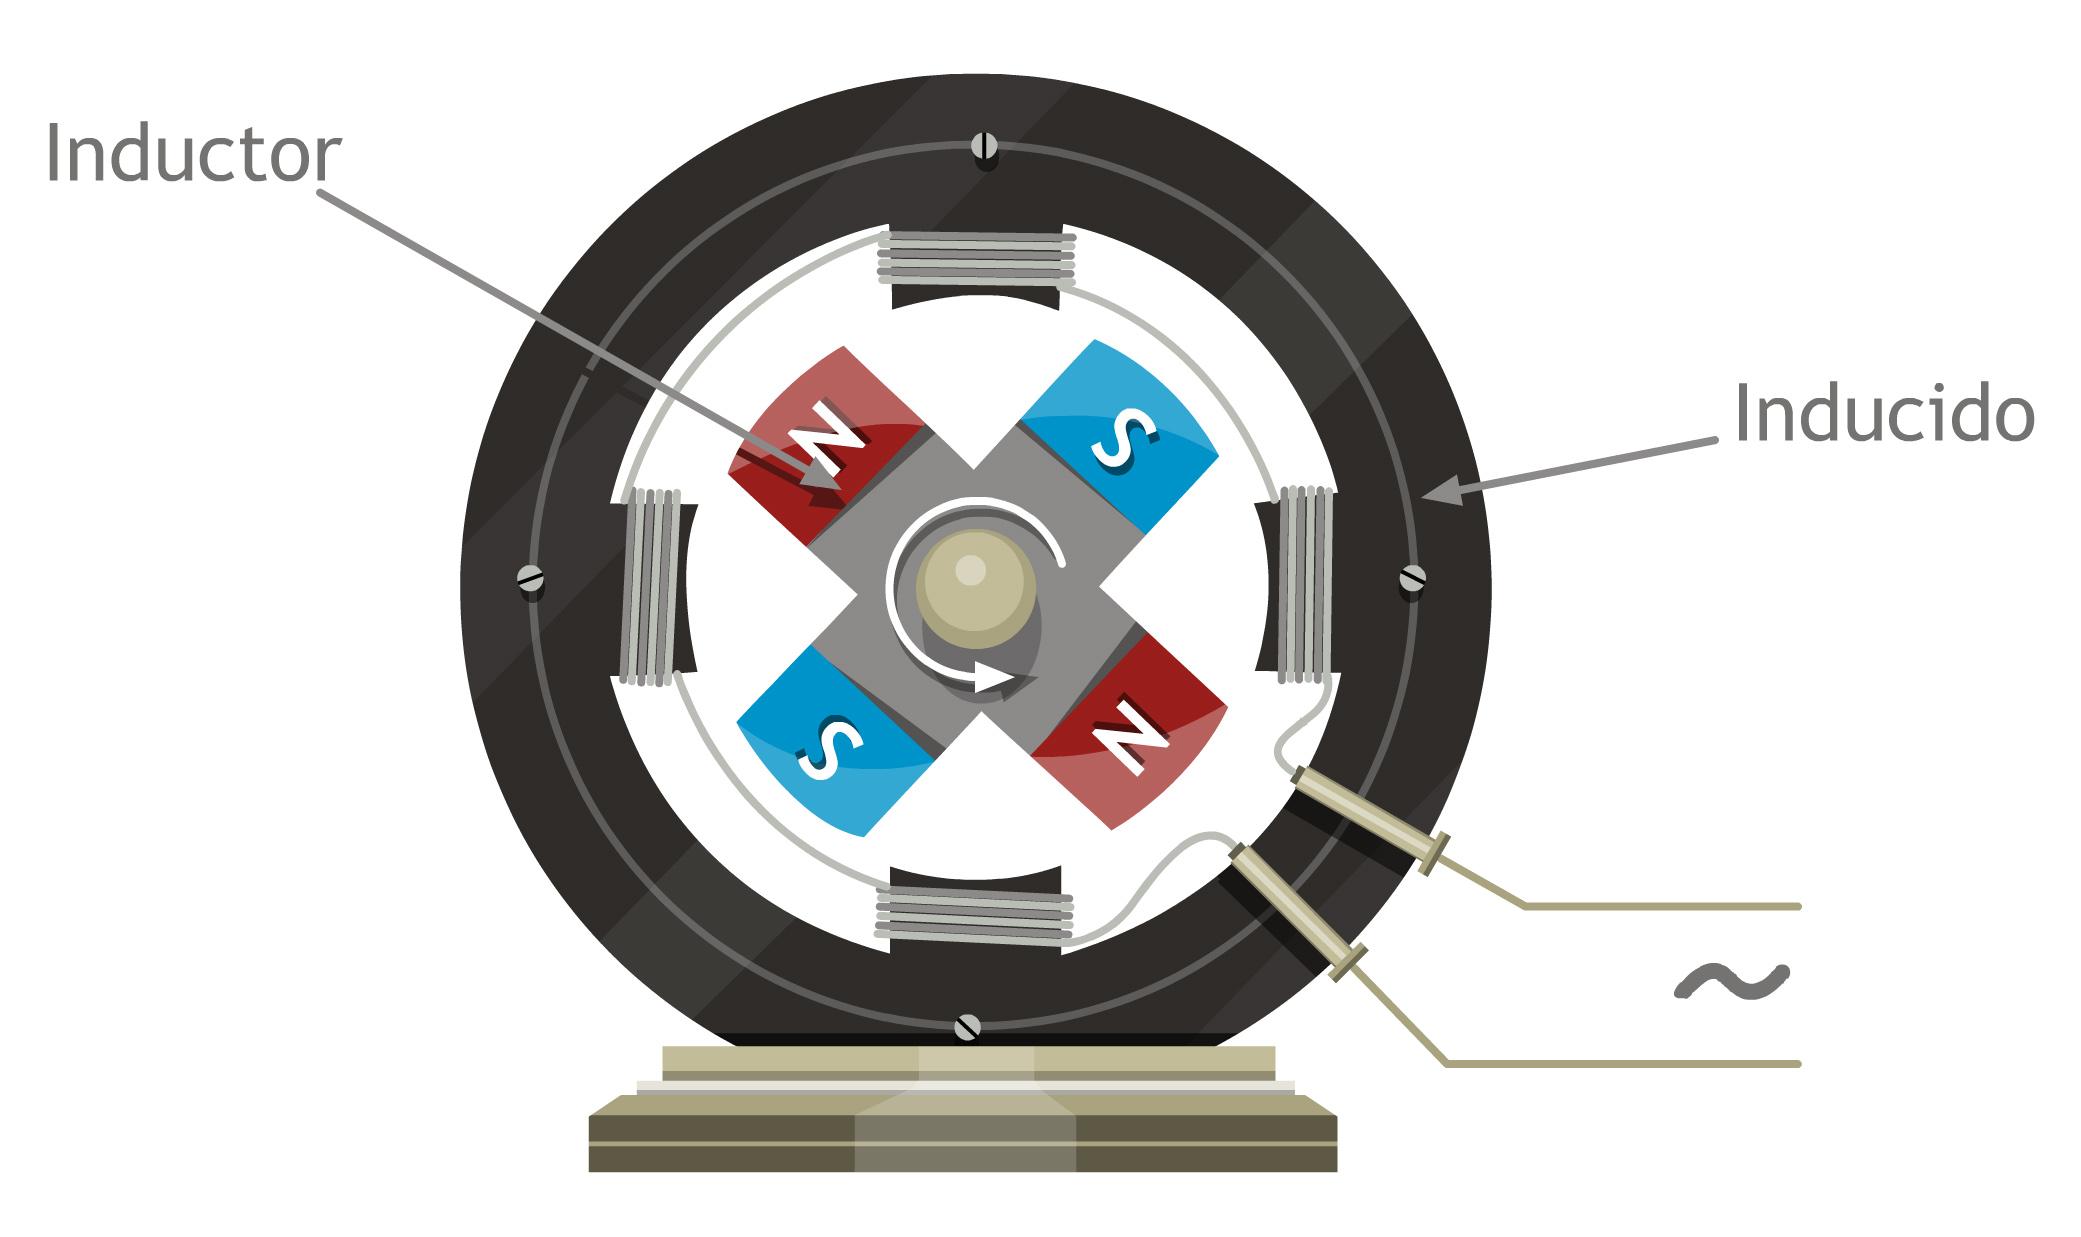 Modelizacion inducido e inductor